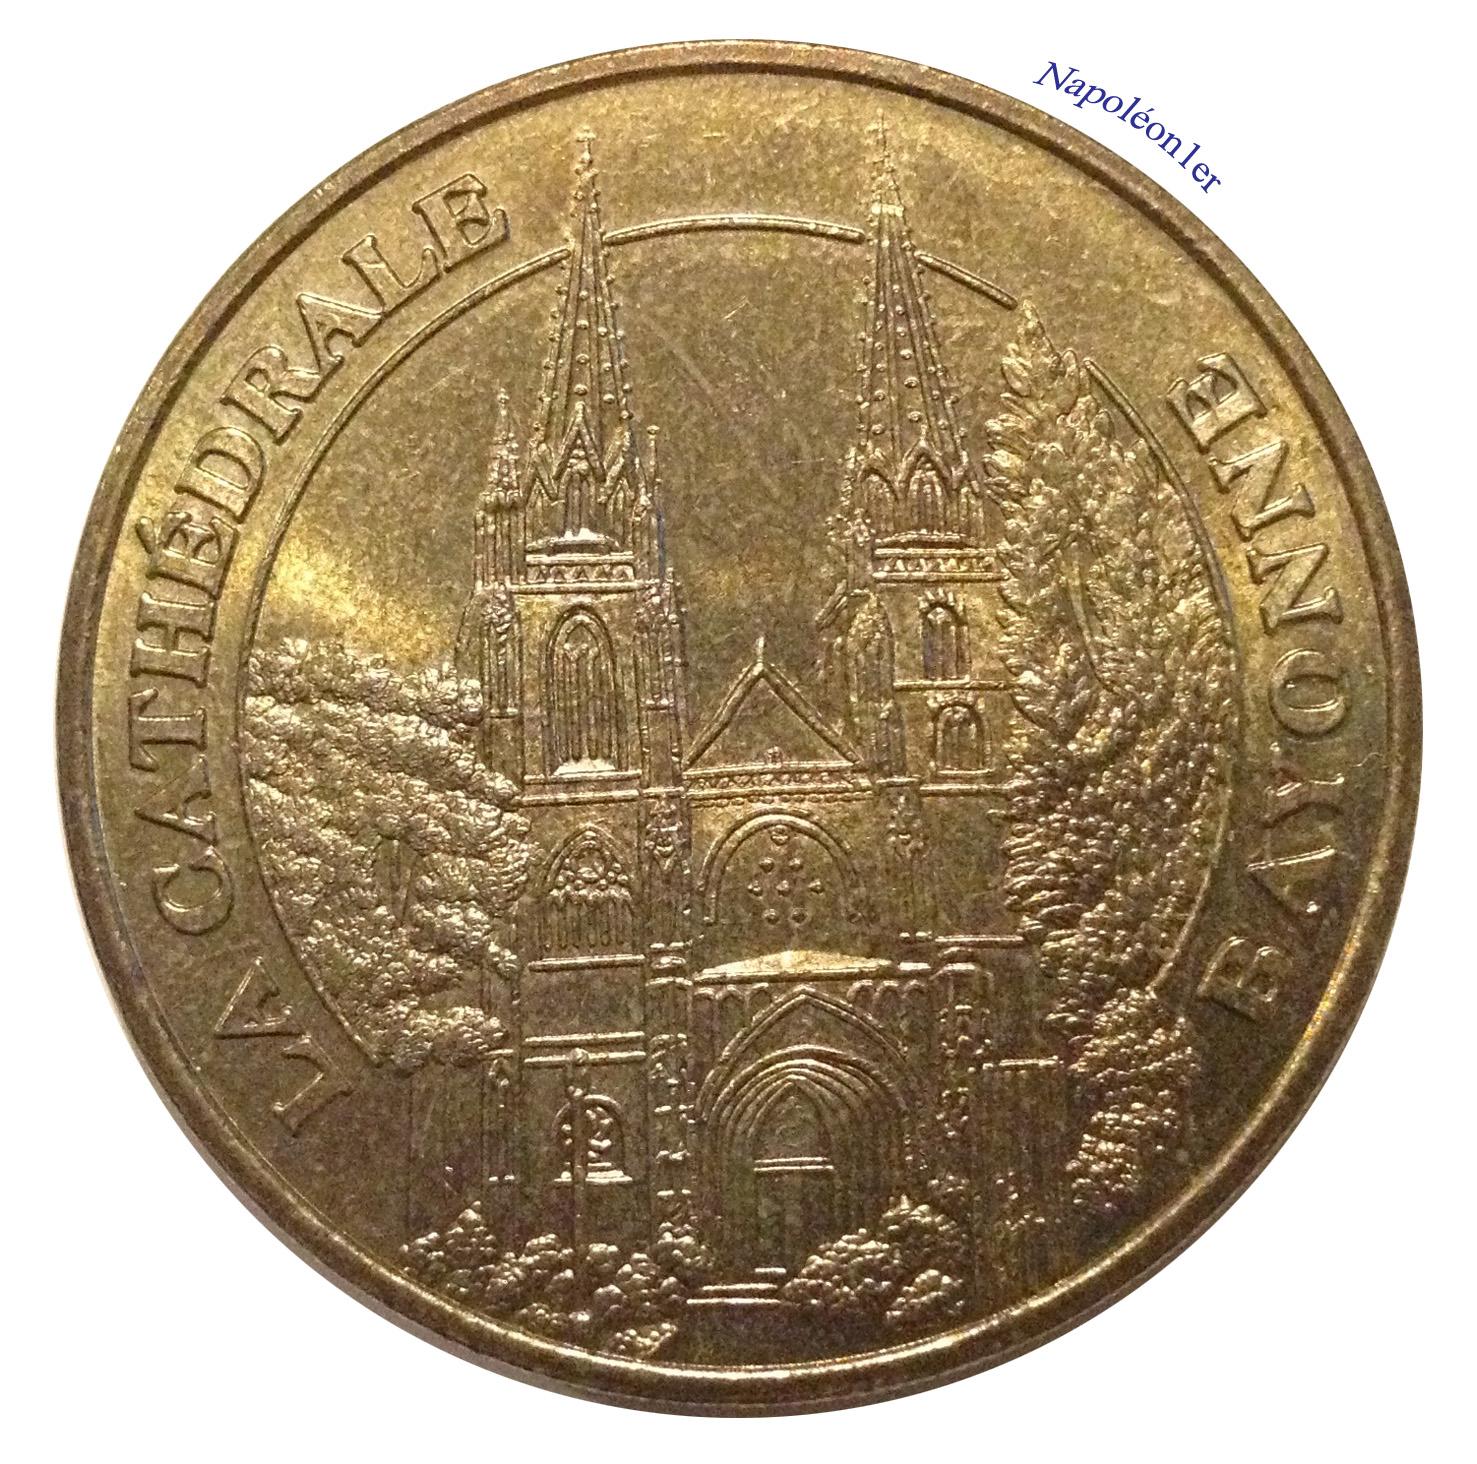 monnaie de paris bayonne